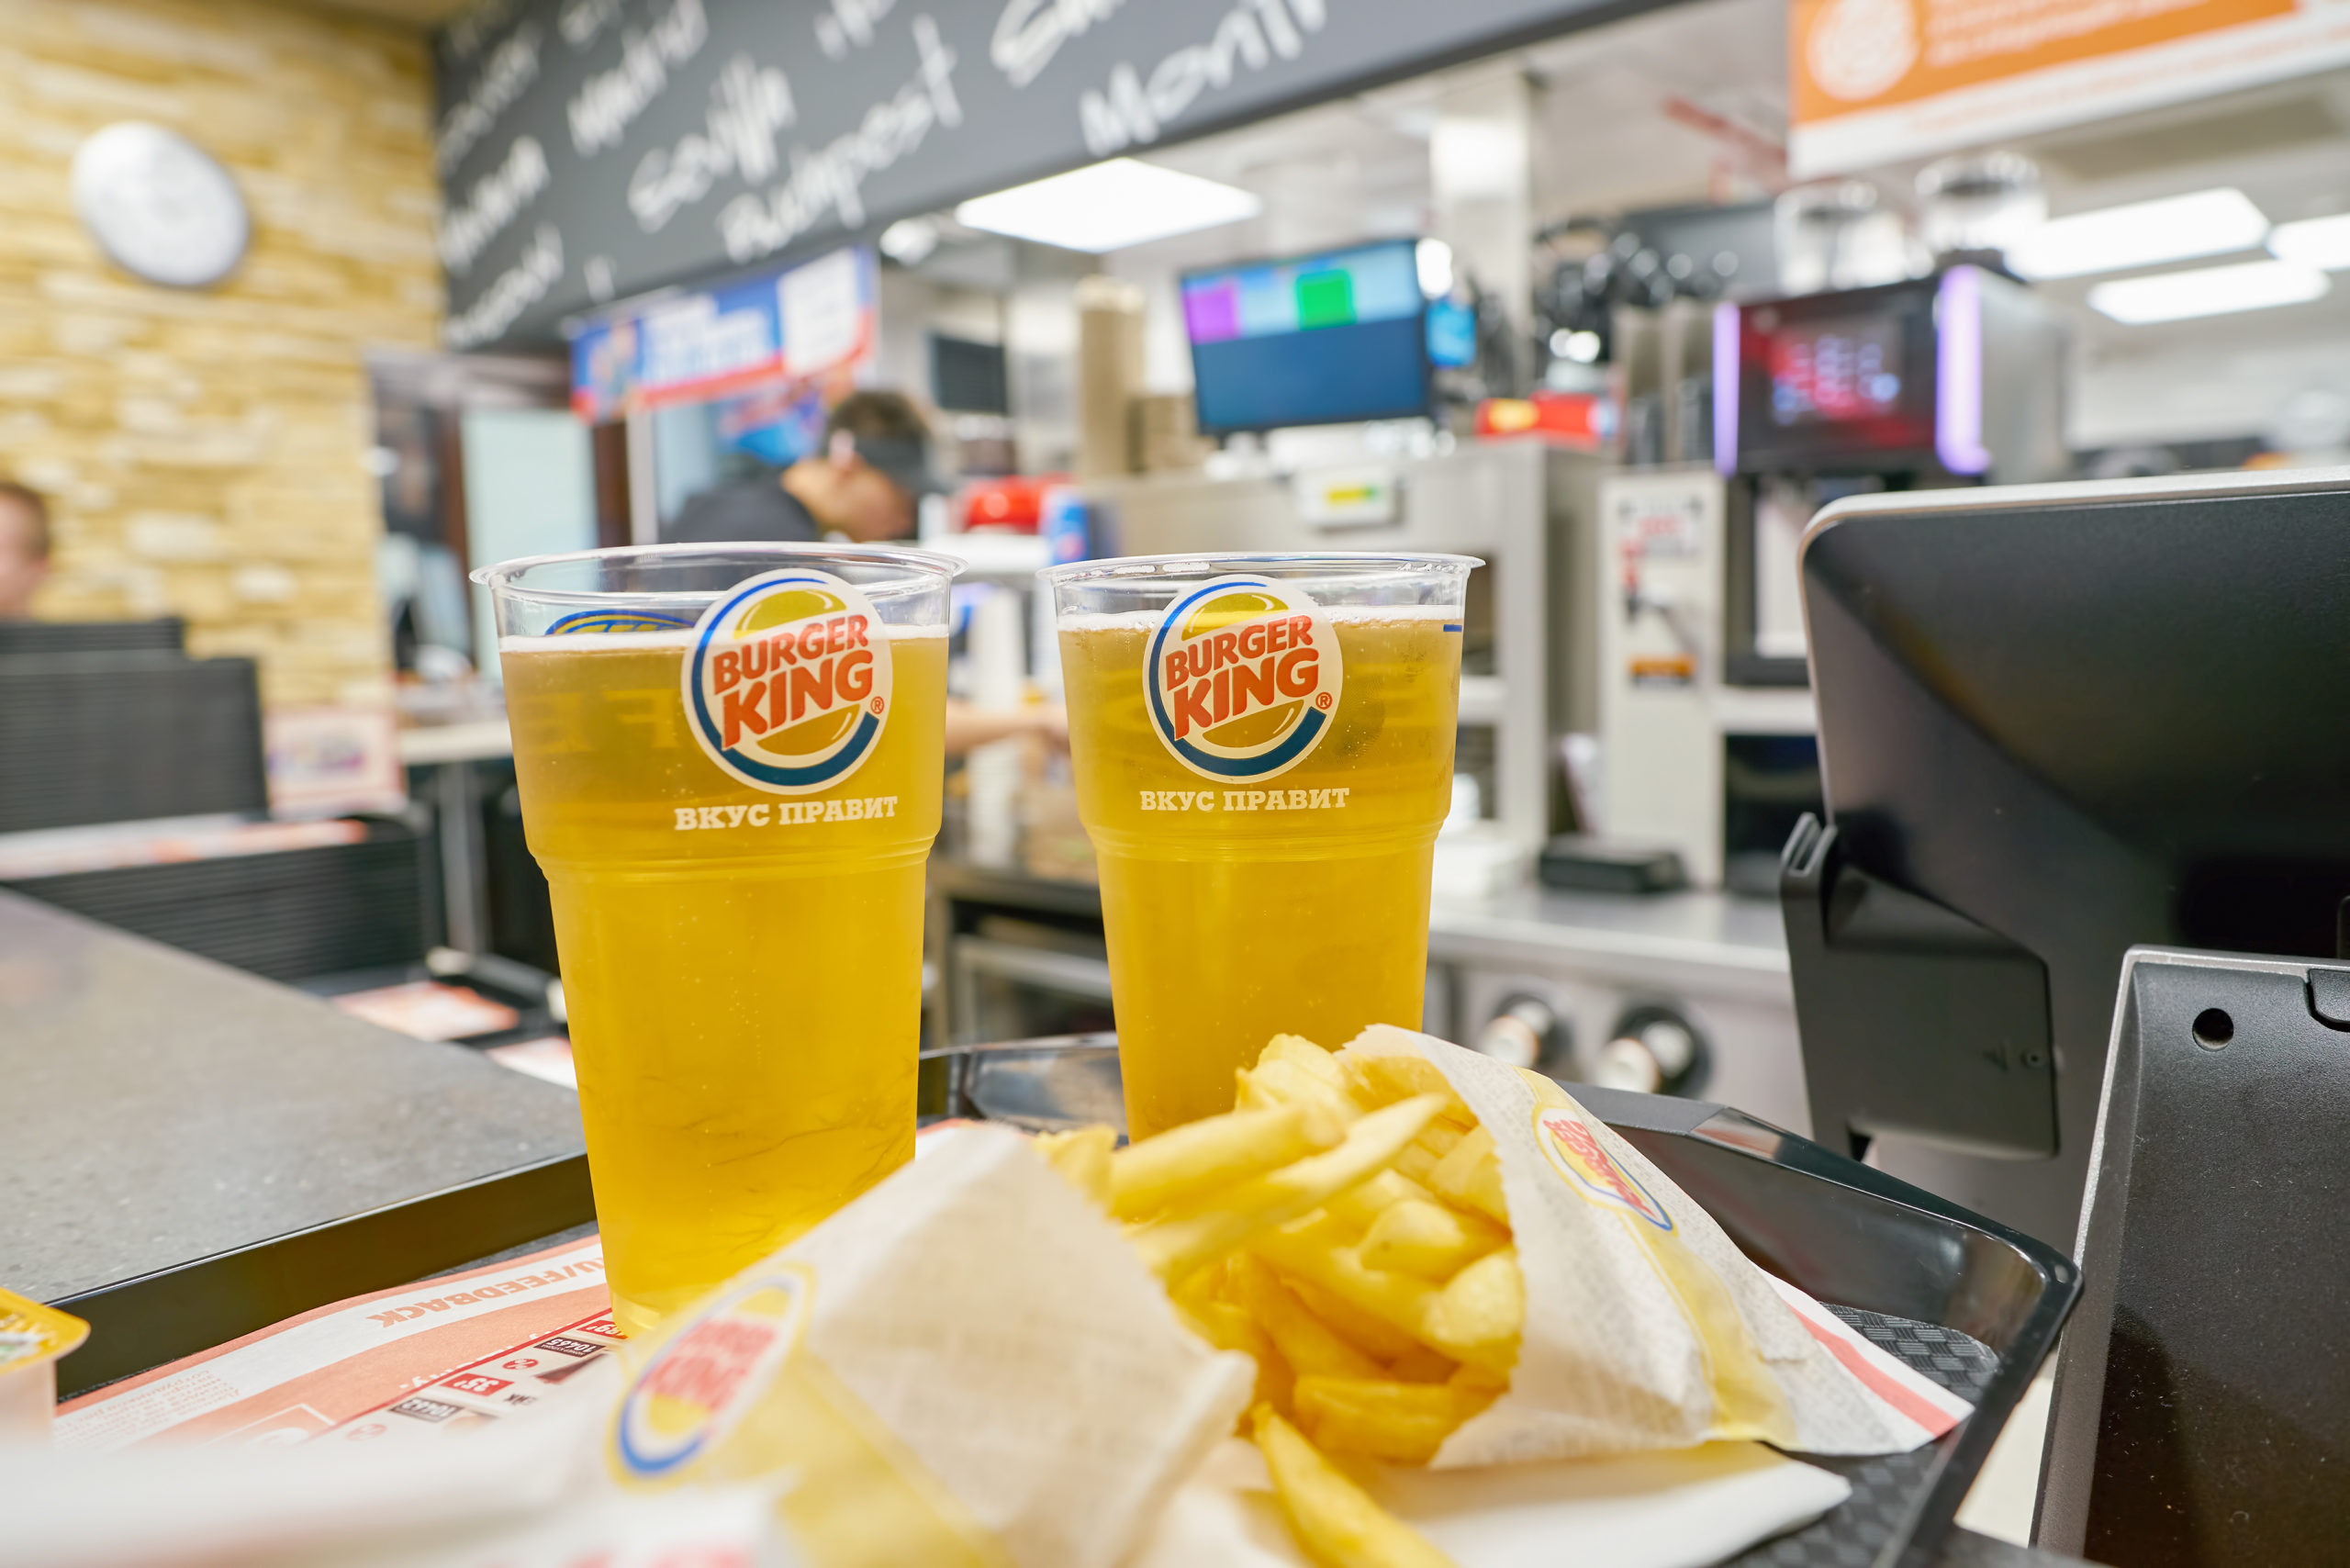 Casper may allow fast food restaurants to serve alcohol or Uber Eats, Door Dash to deliver